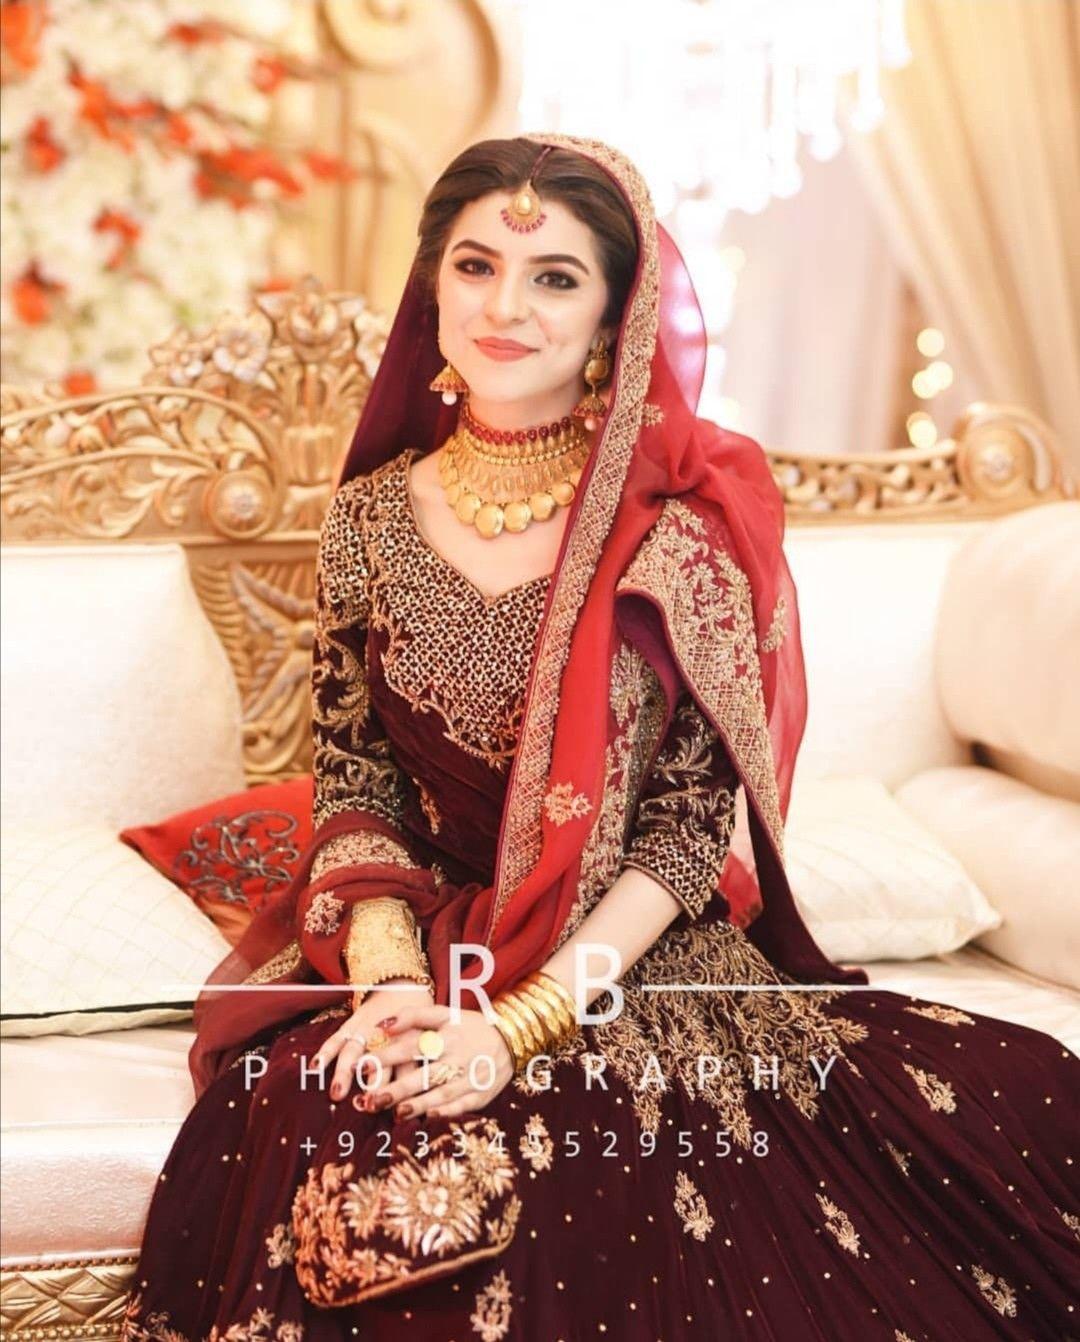 All about weddings image by ks pakistani bridal